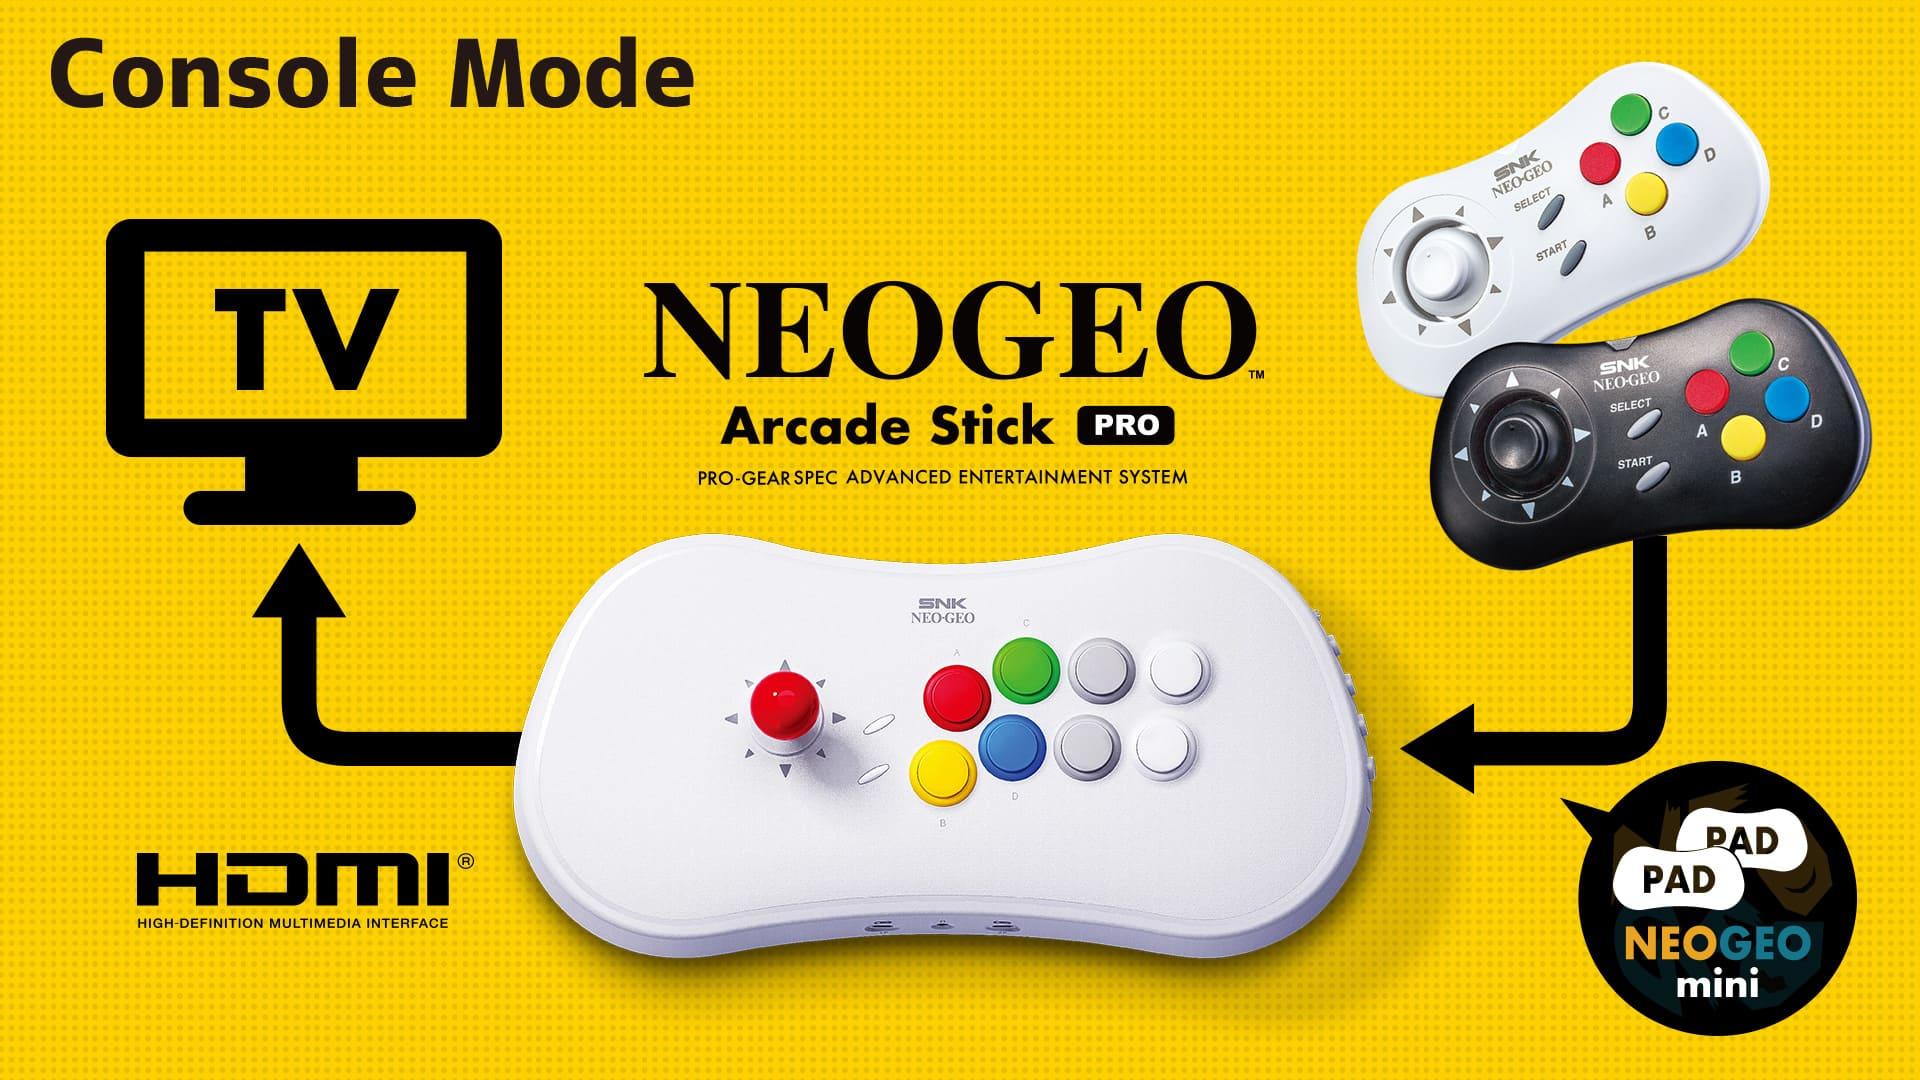 NEOGEO Arcade Stick Pro Console Mode